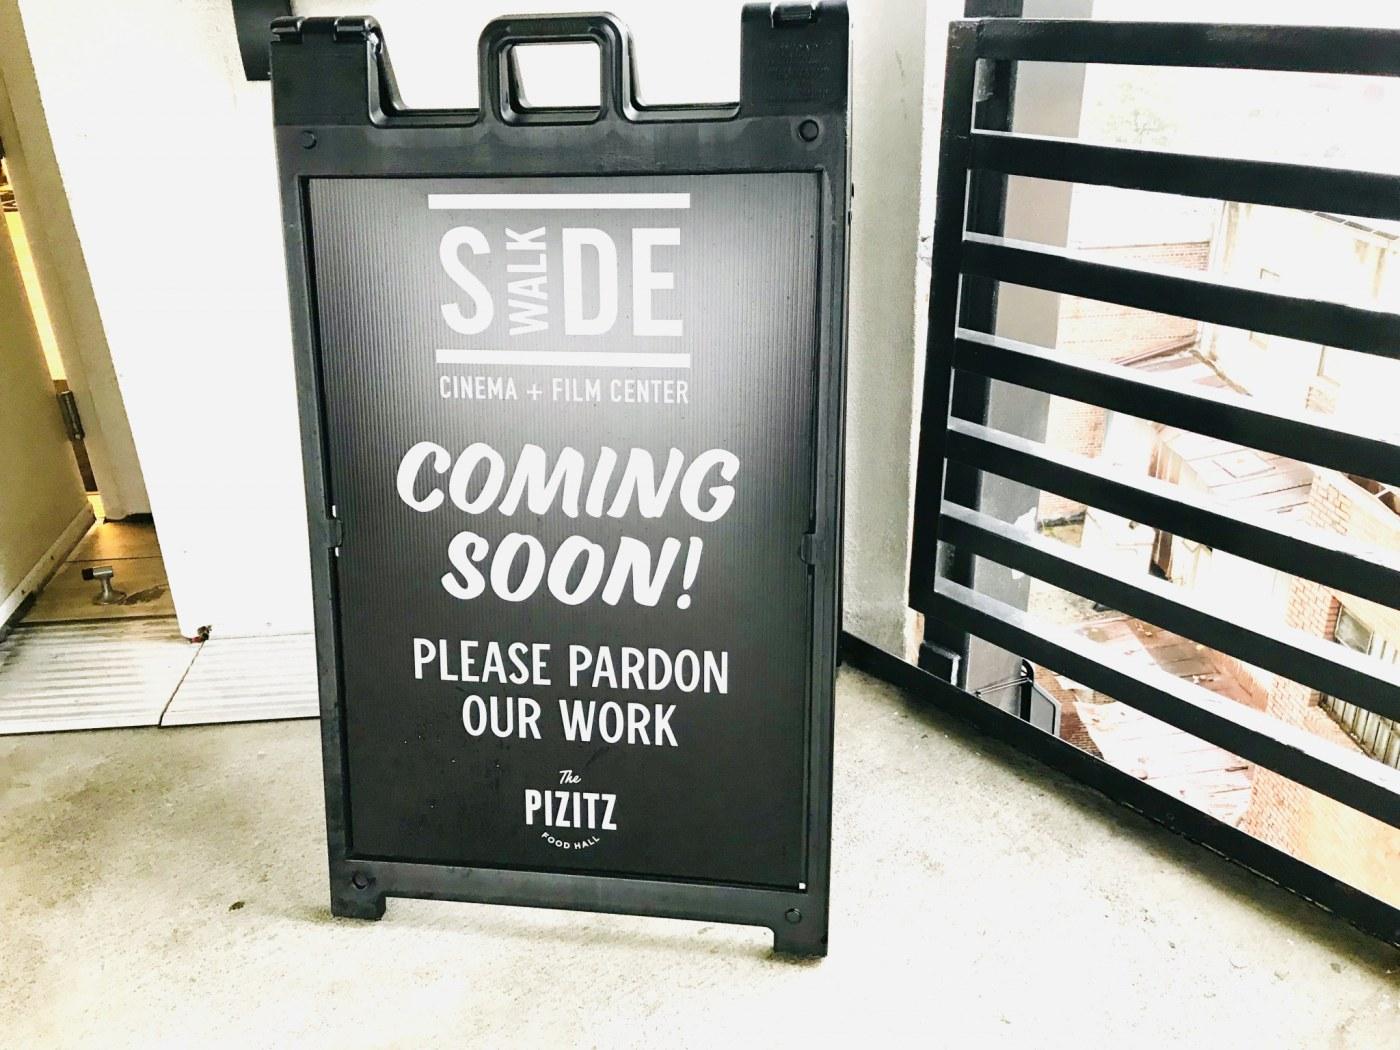 Sidewalk Cinema is coming soon! (Photo by Lauren Bedford for Bham Now)